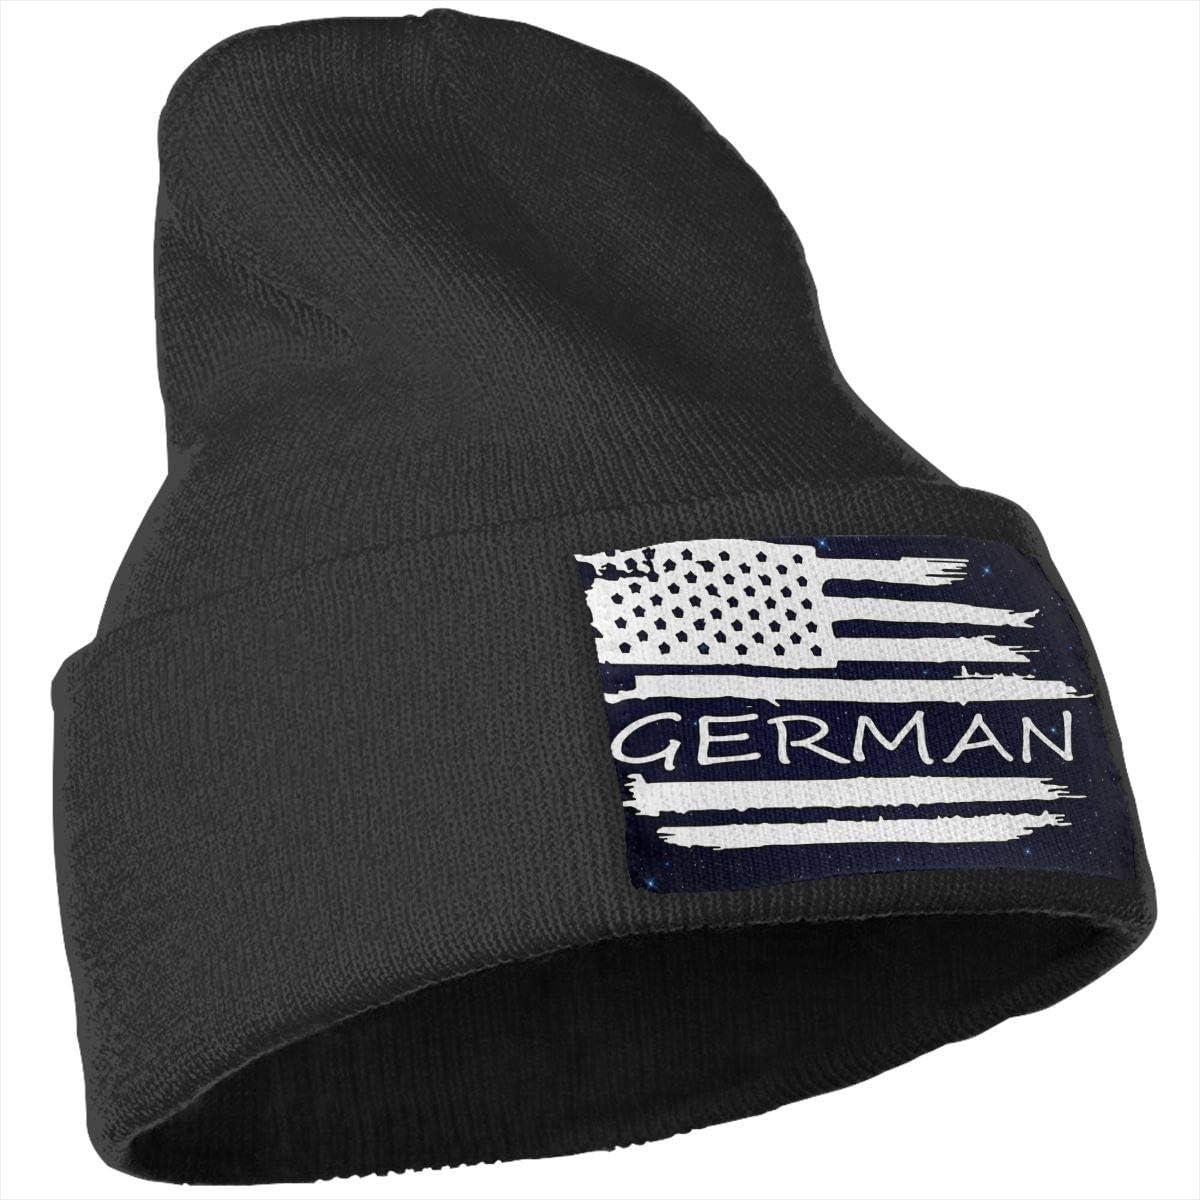 American Flag German Flag Men /& Women Solid Color Knit Beanie Hat Stretchy /& Soft Winter Ski Knit Cap